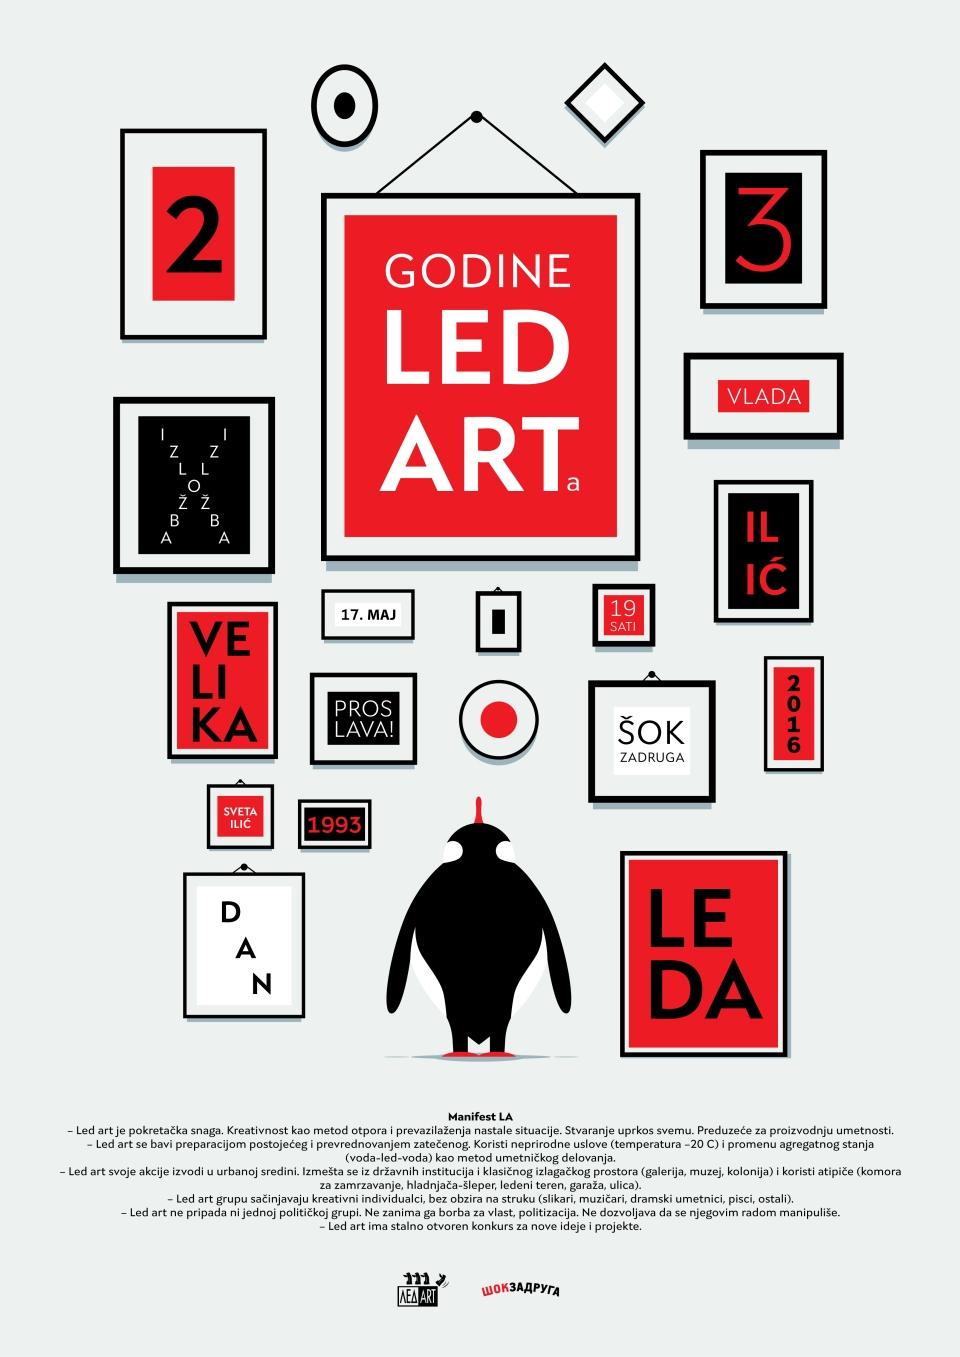 plakat_23_GODINE_LED_ARTa